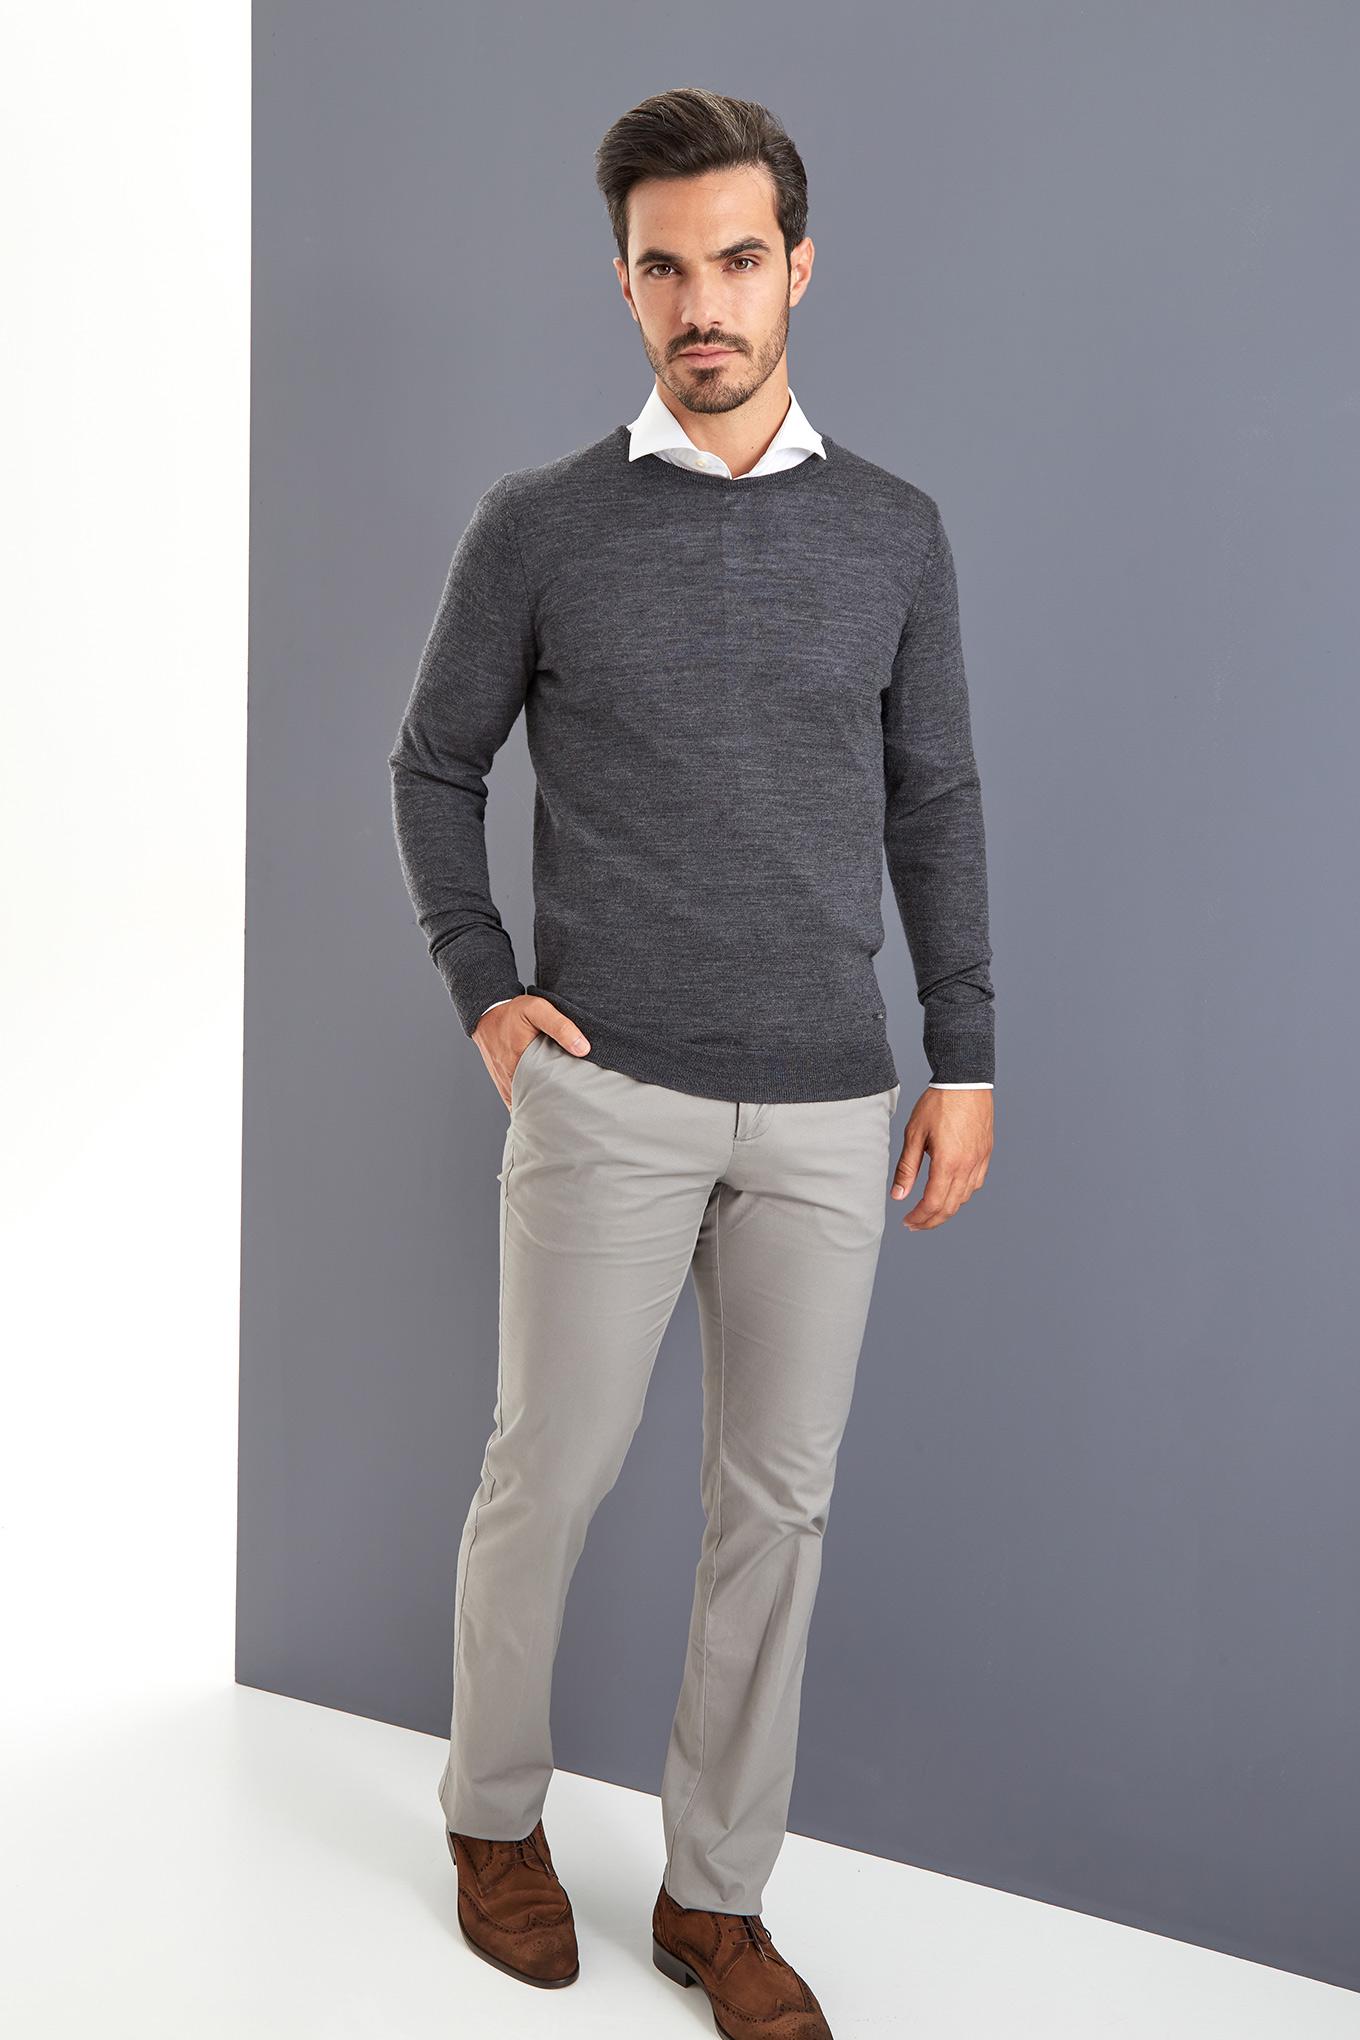 Sweater Dark Grey Casual Man